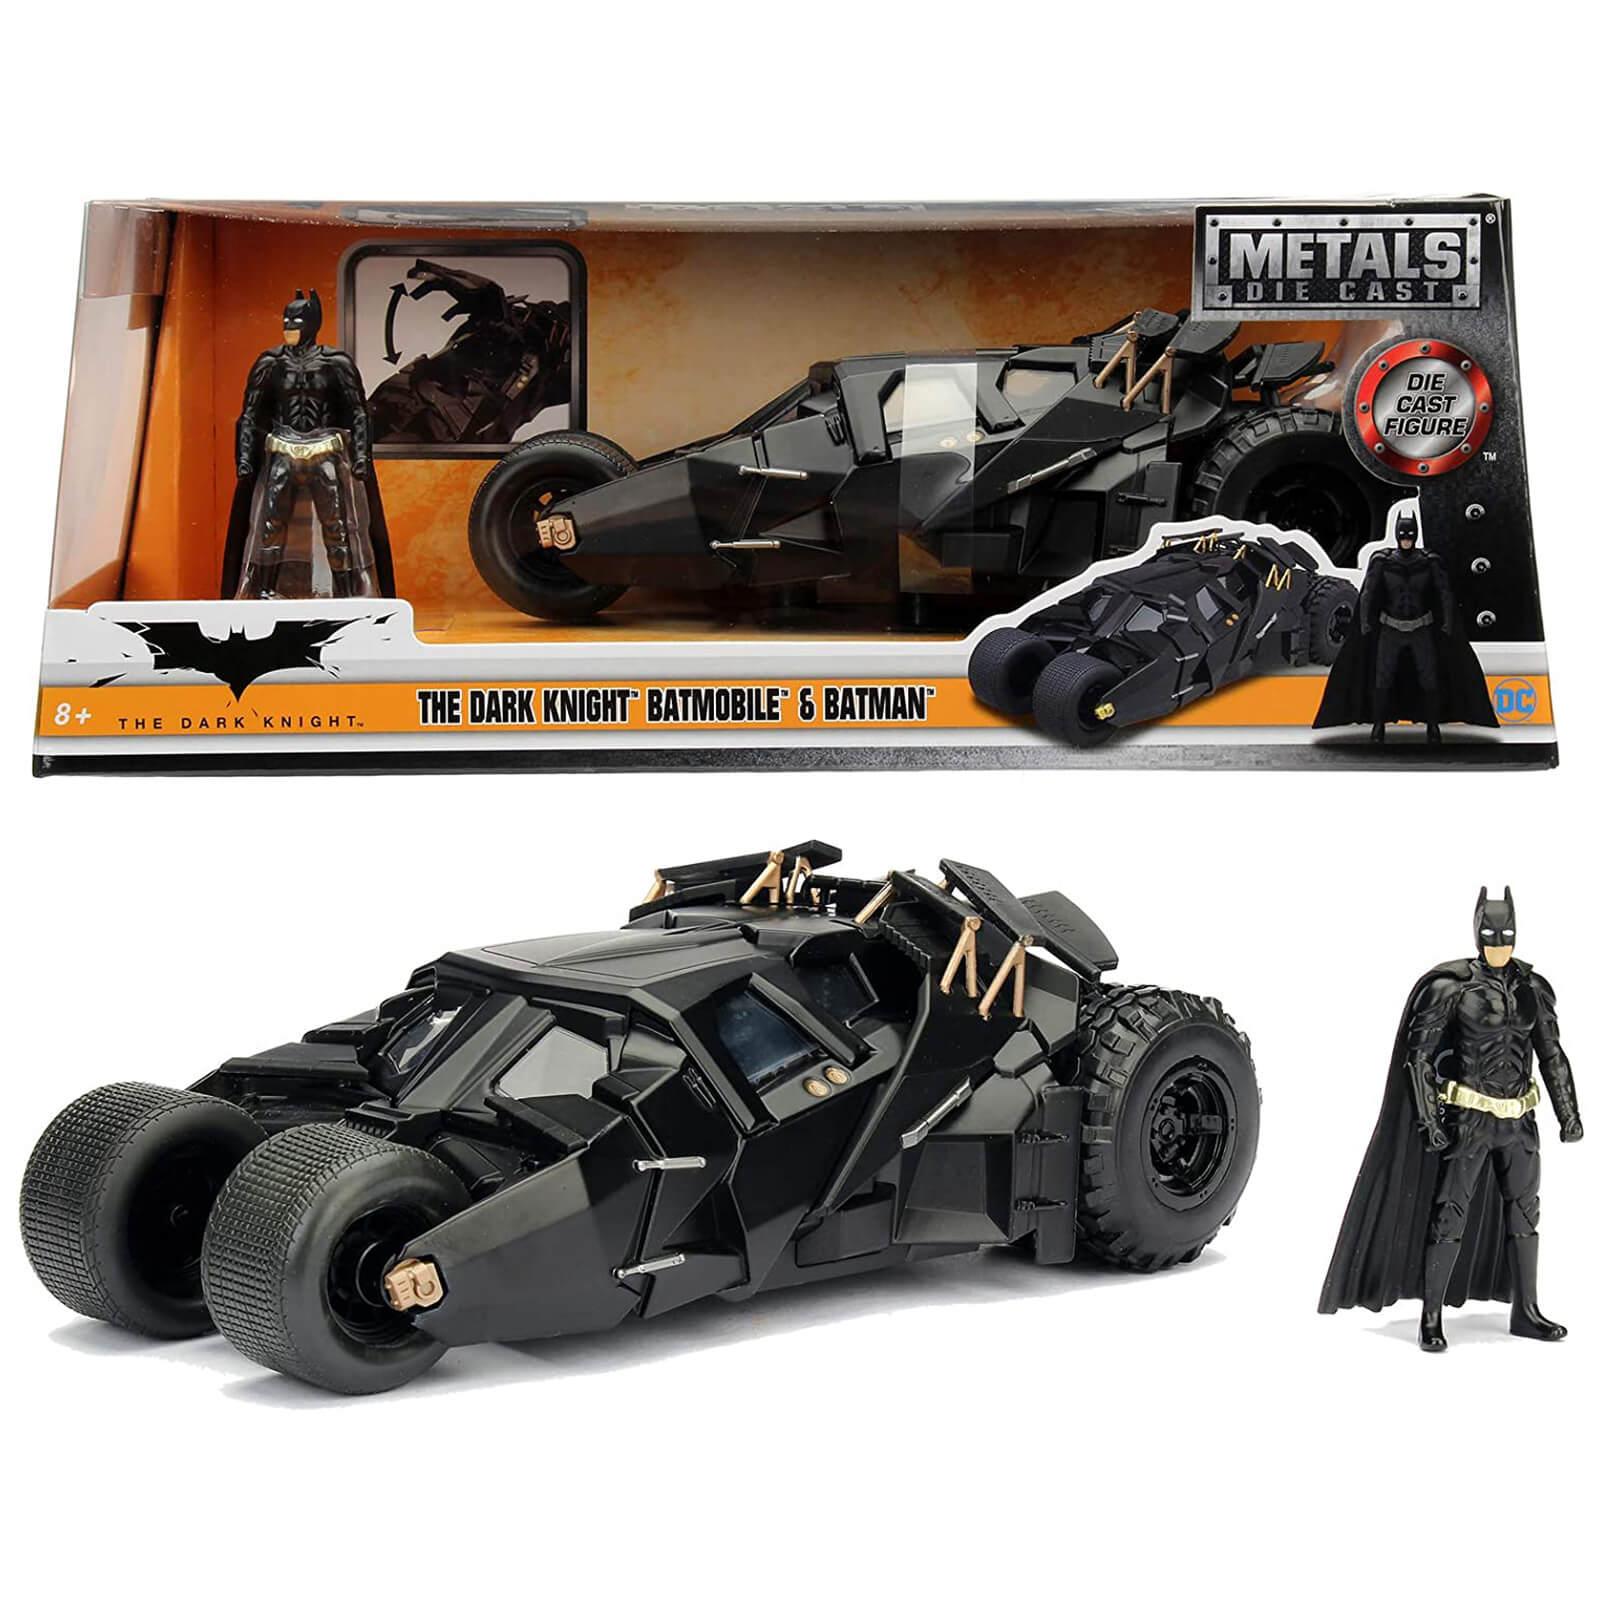 Jada Toys Batman The Dark Knight Batmobile 1:24